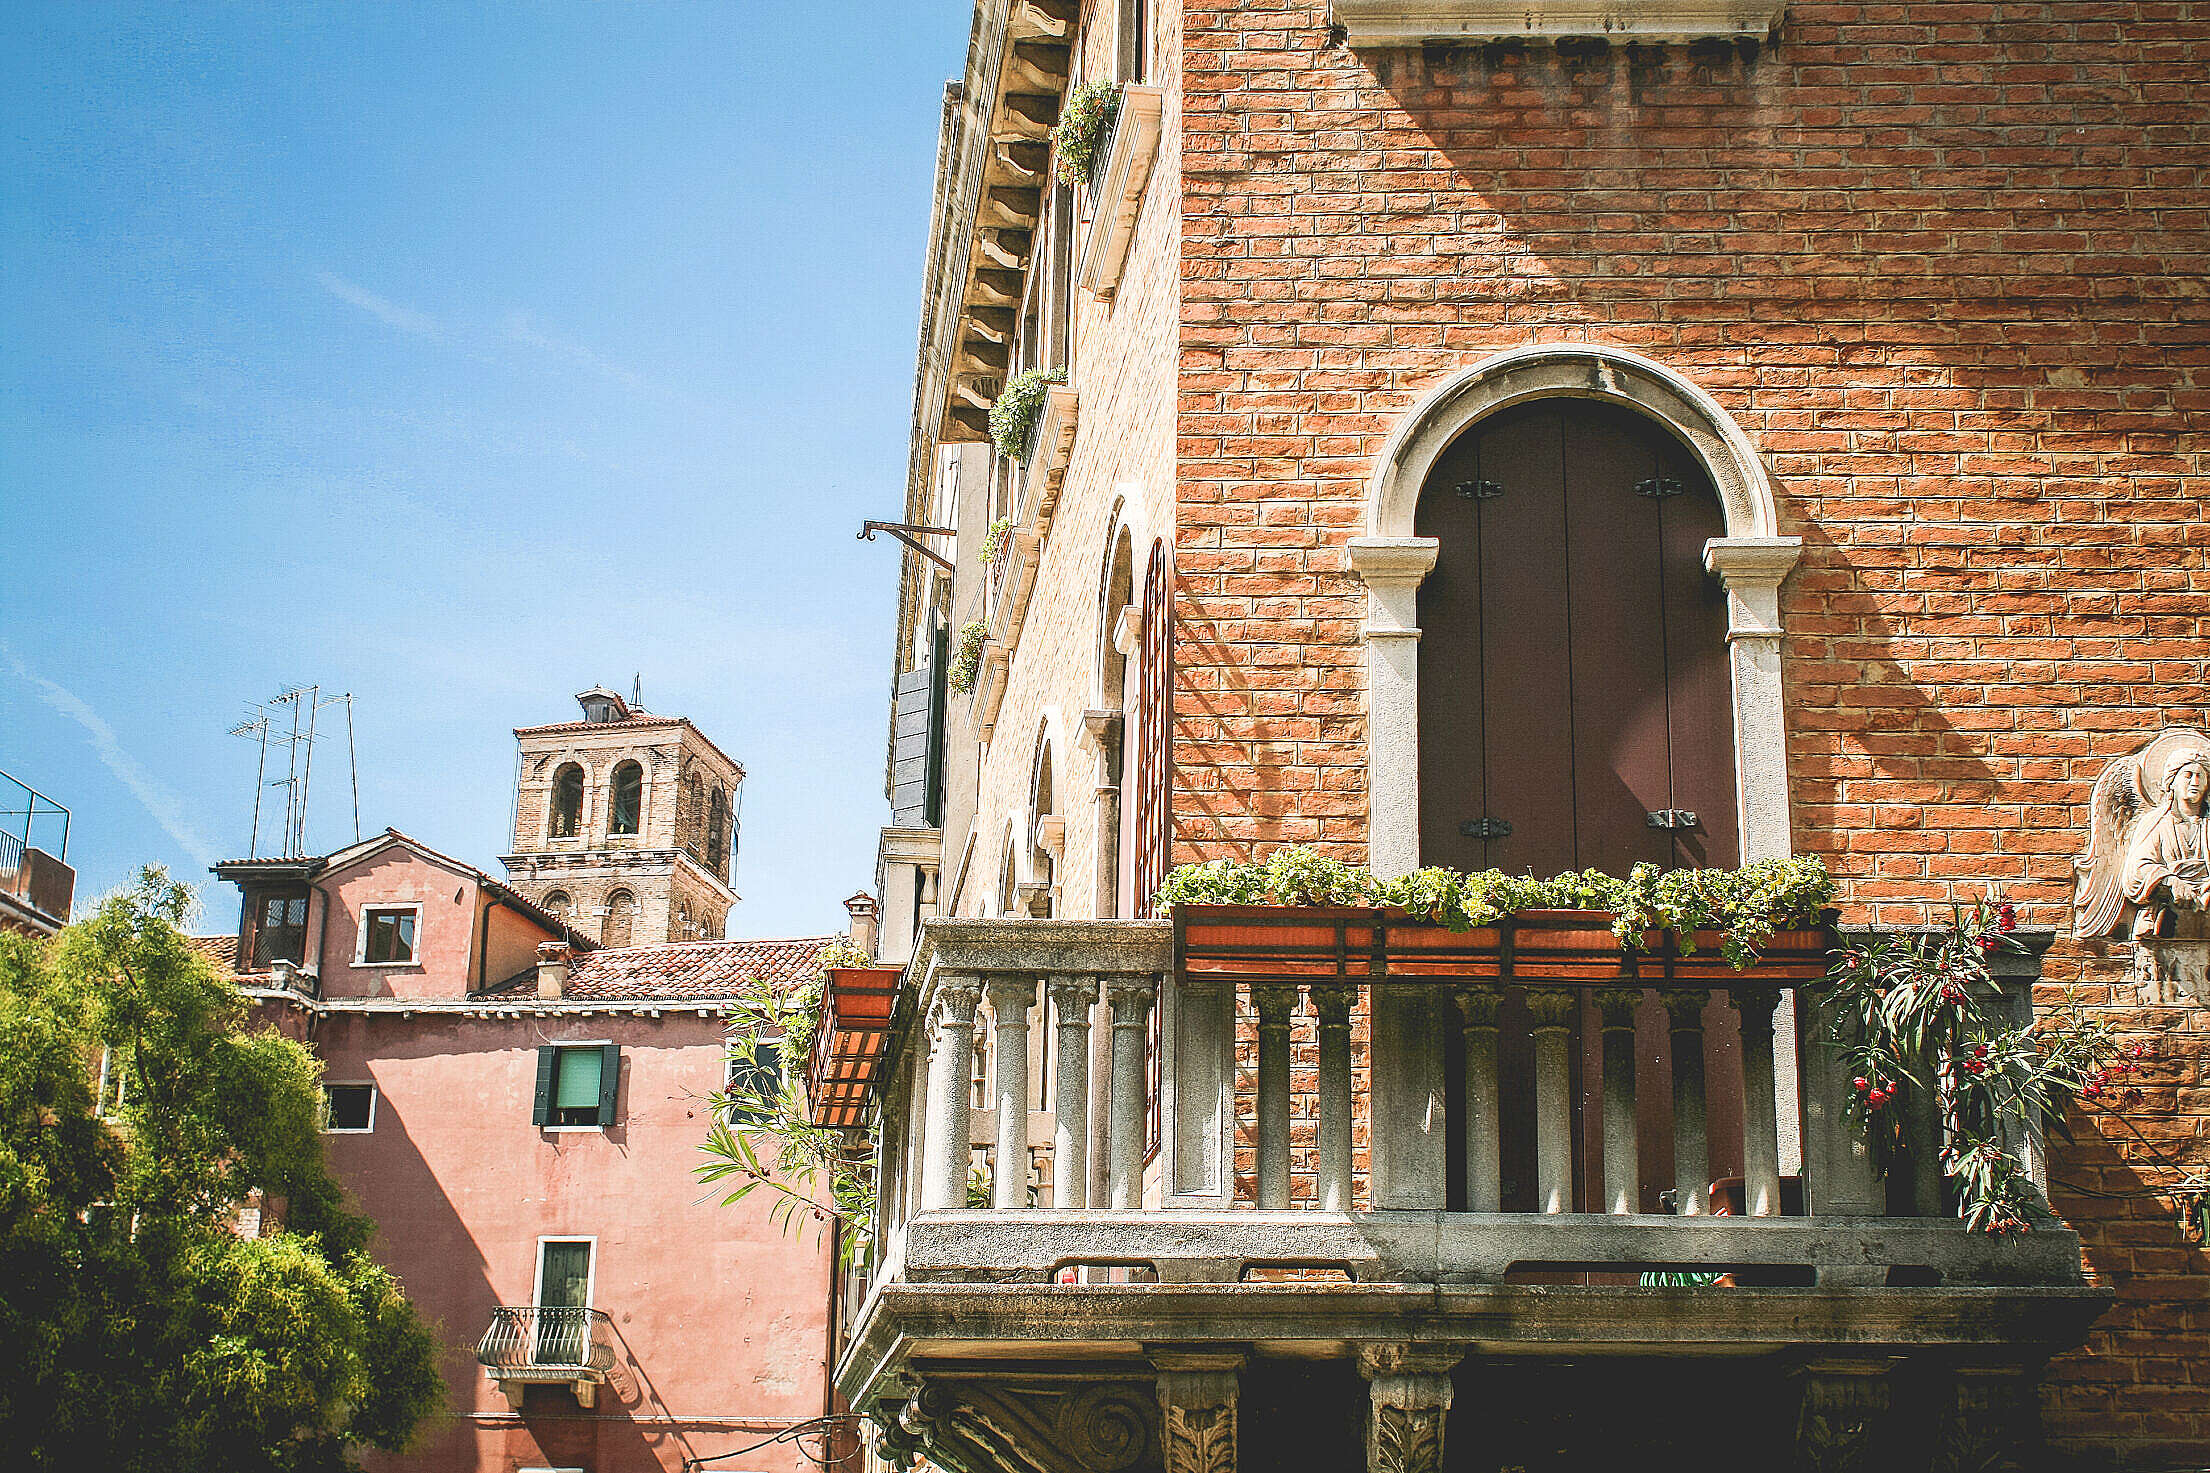 Beautiful Venice Summer Architecture Free Stock Photo